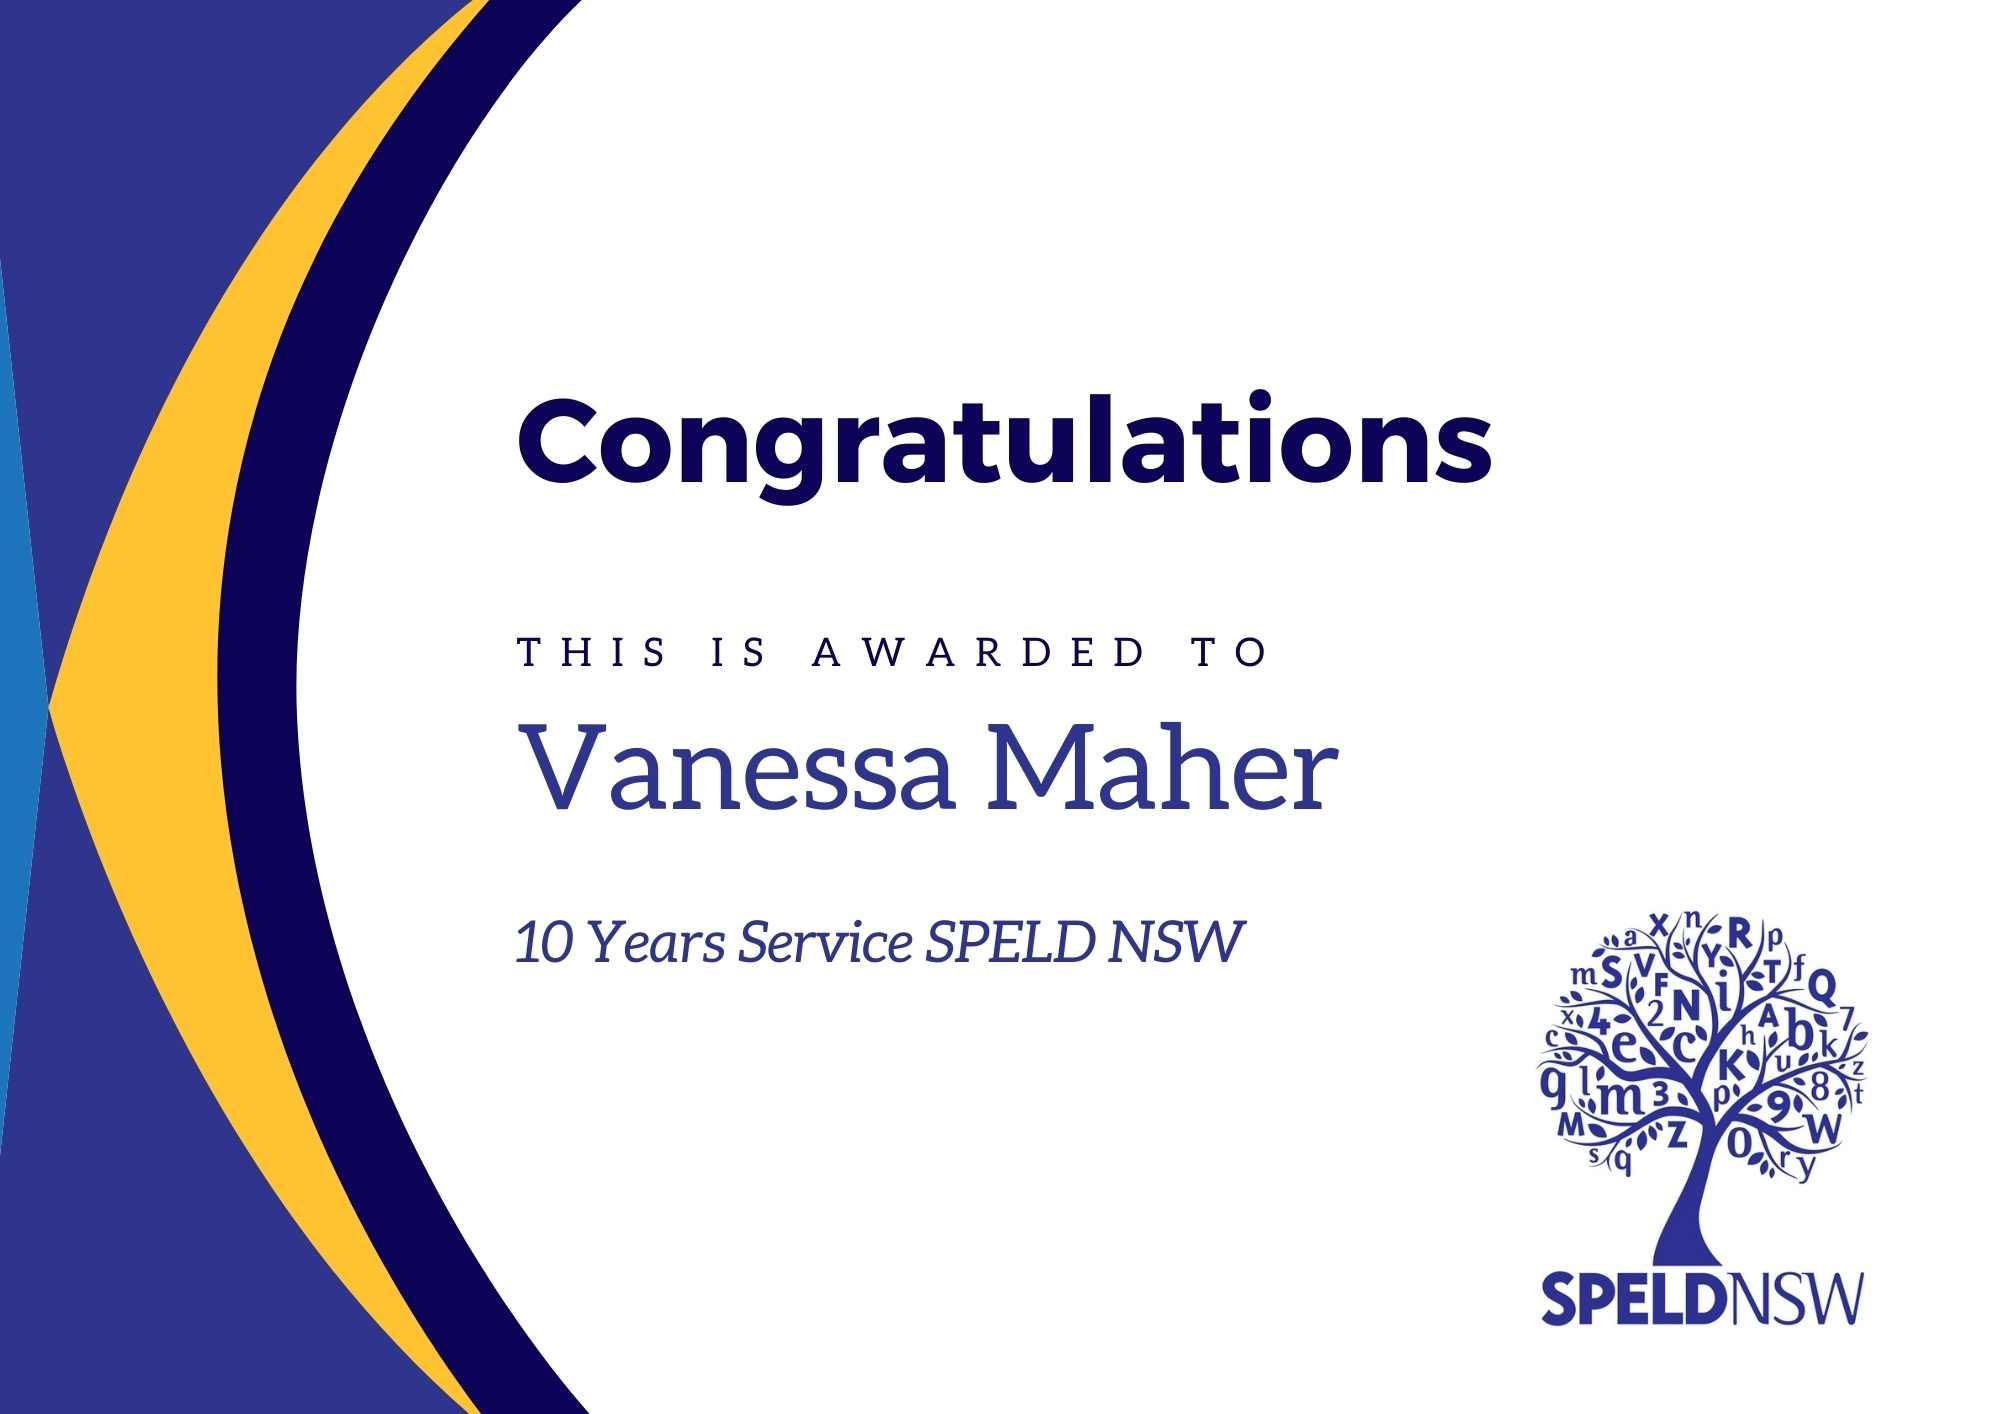 Congratulations Vanessa